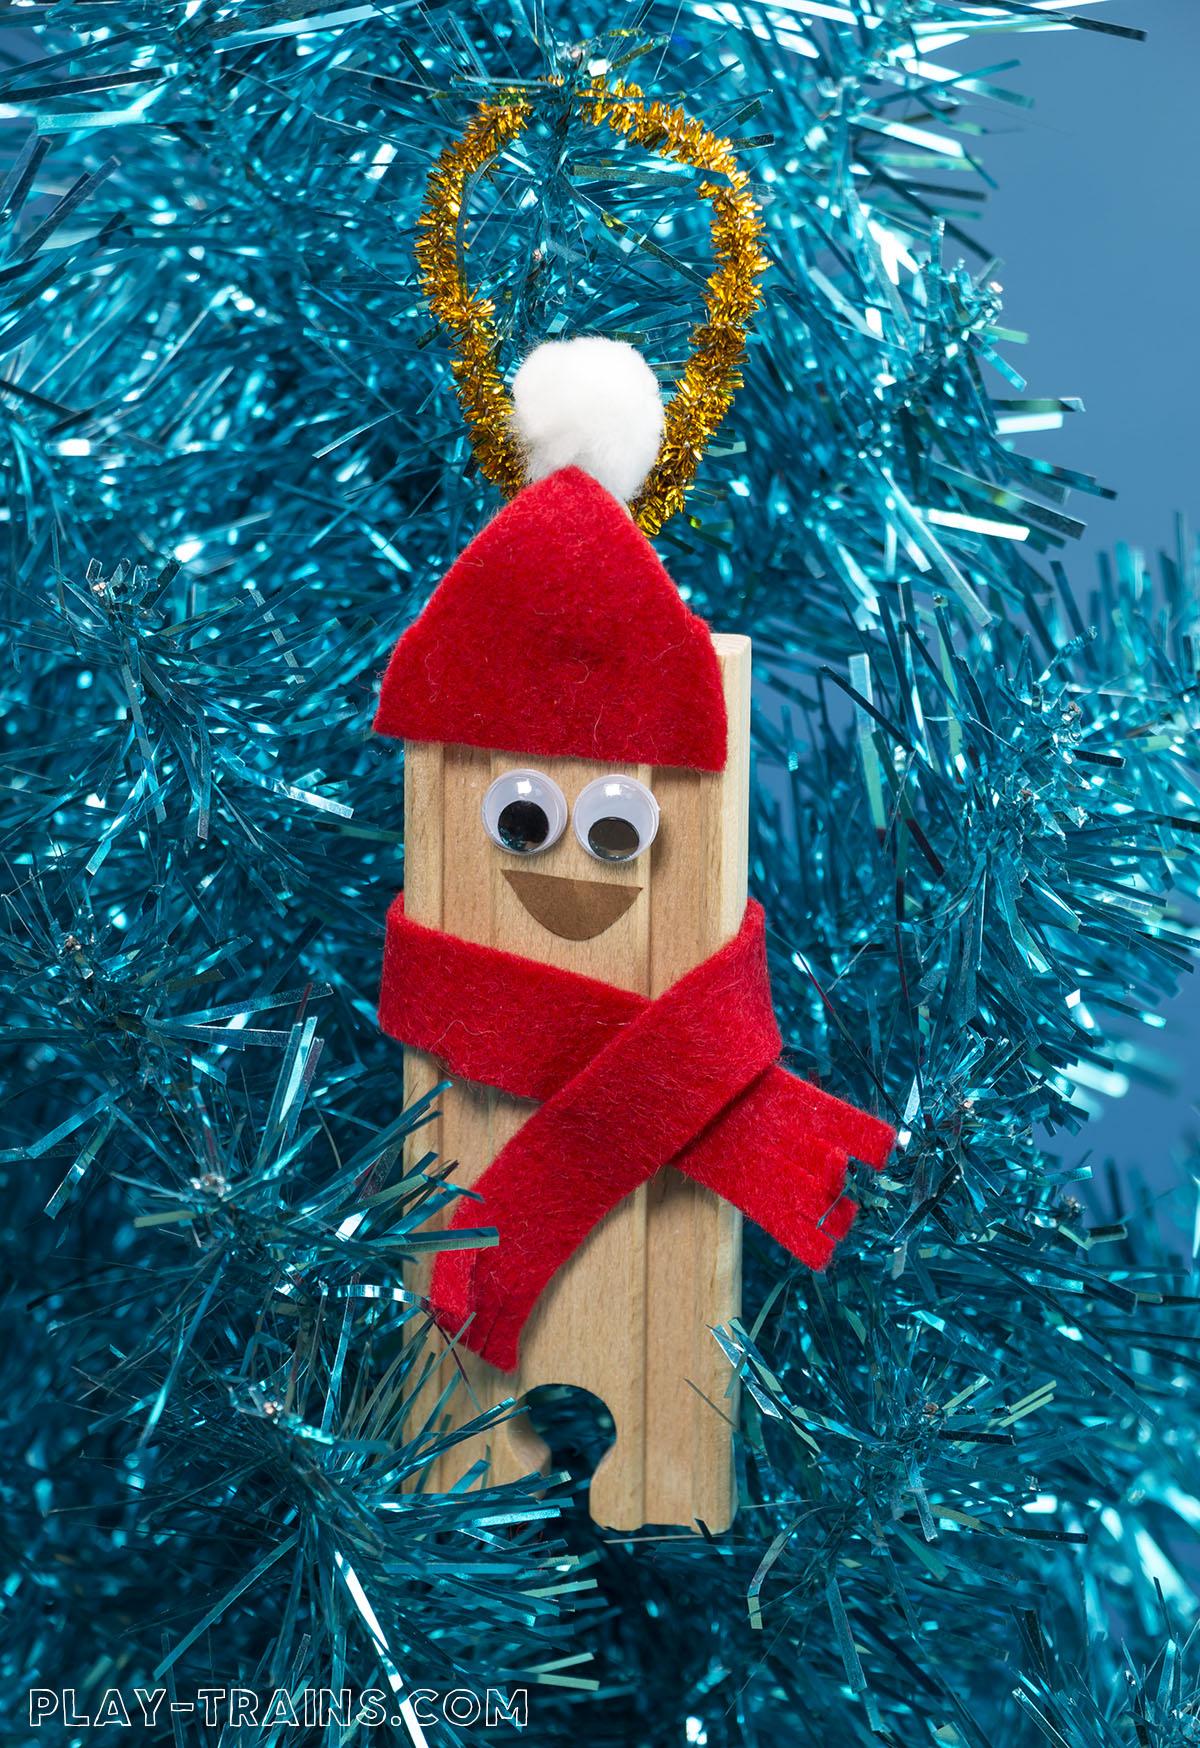 Train Christmas Decorations